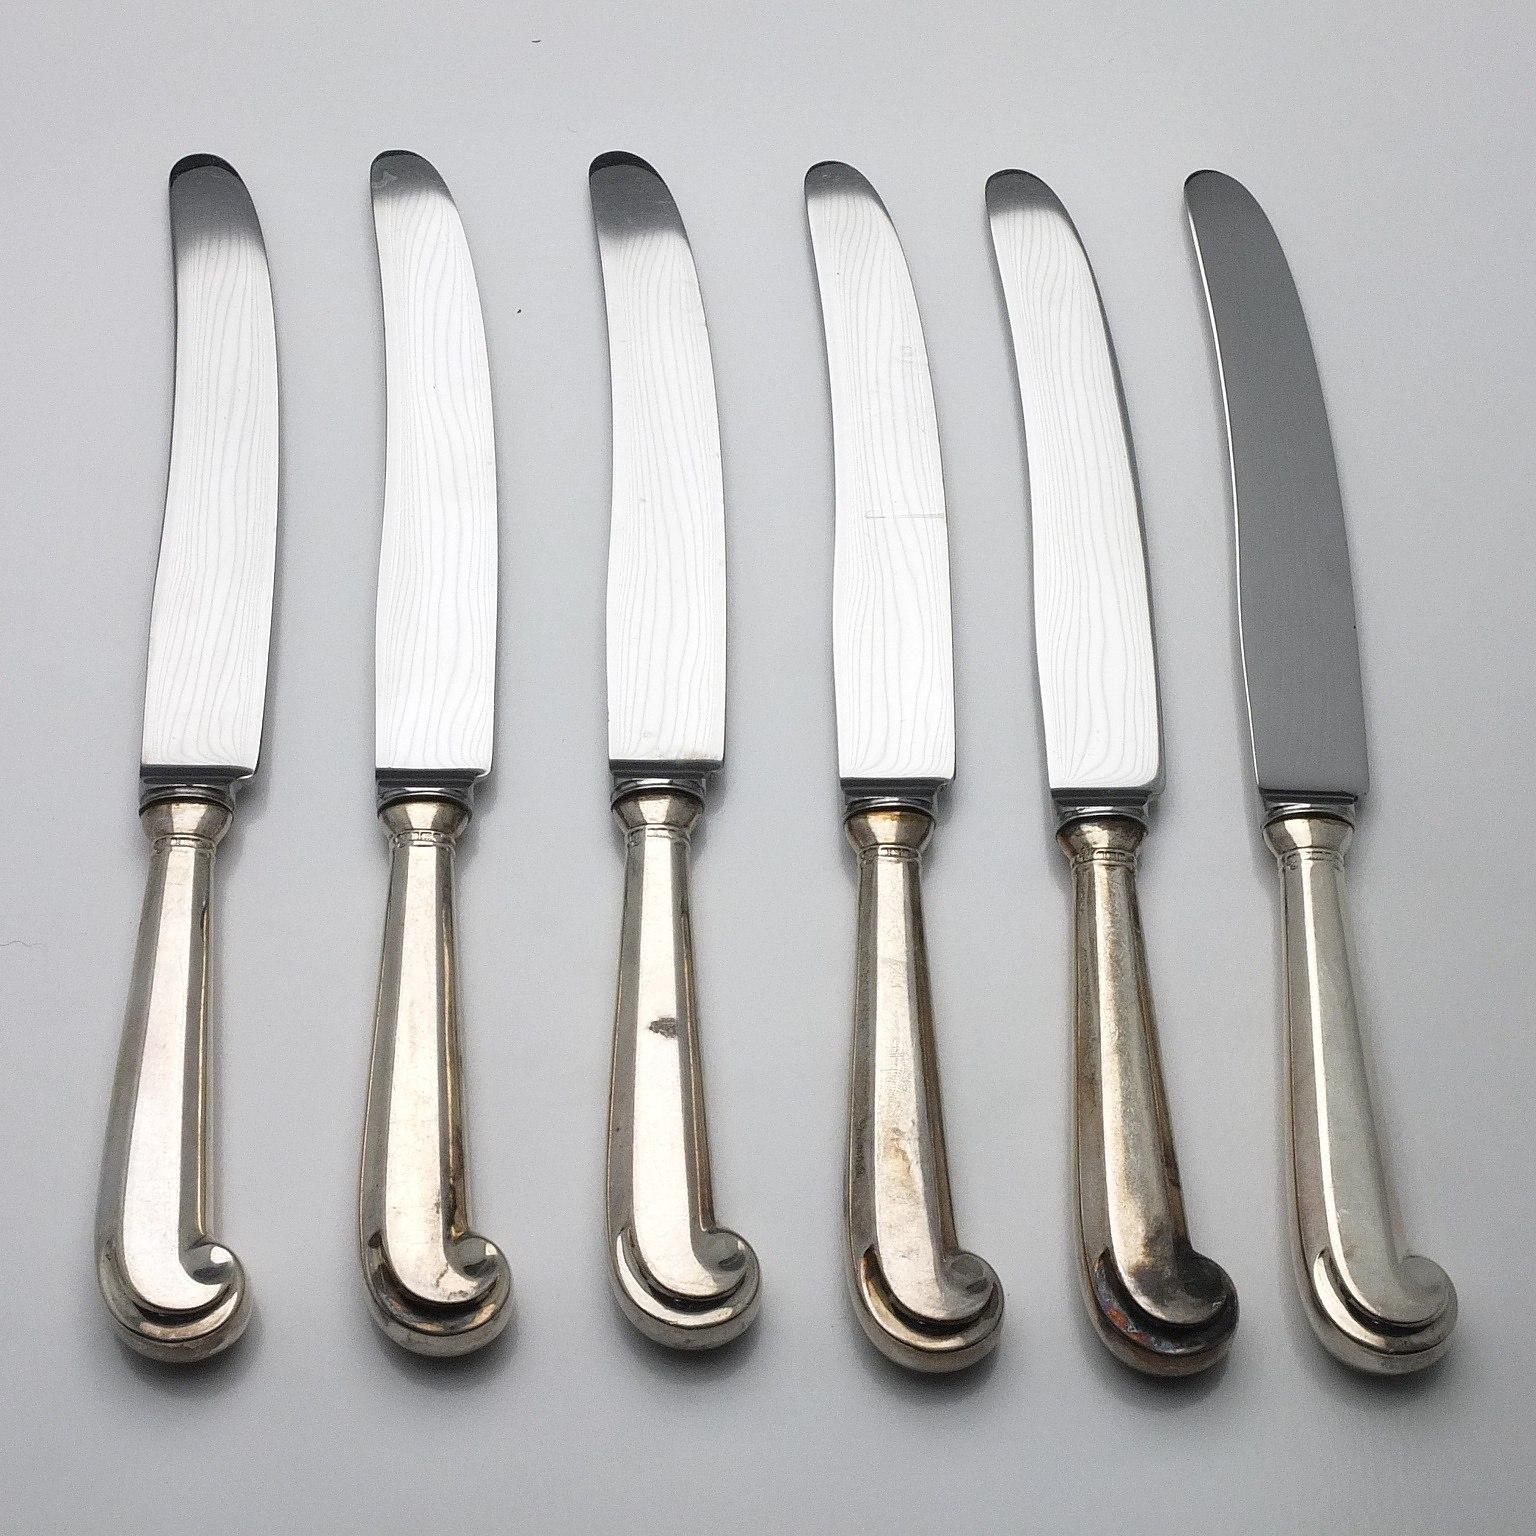 'Six Sterling Silver Handled Mains Knives C J Vander Ltd Sheffield'